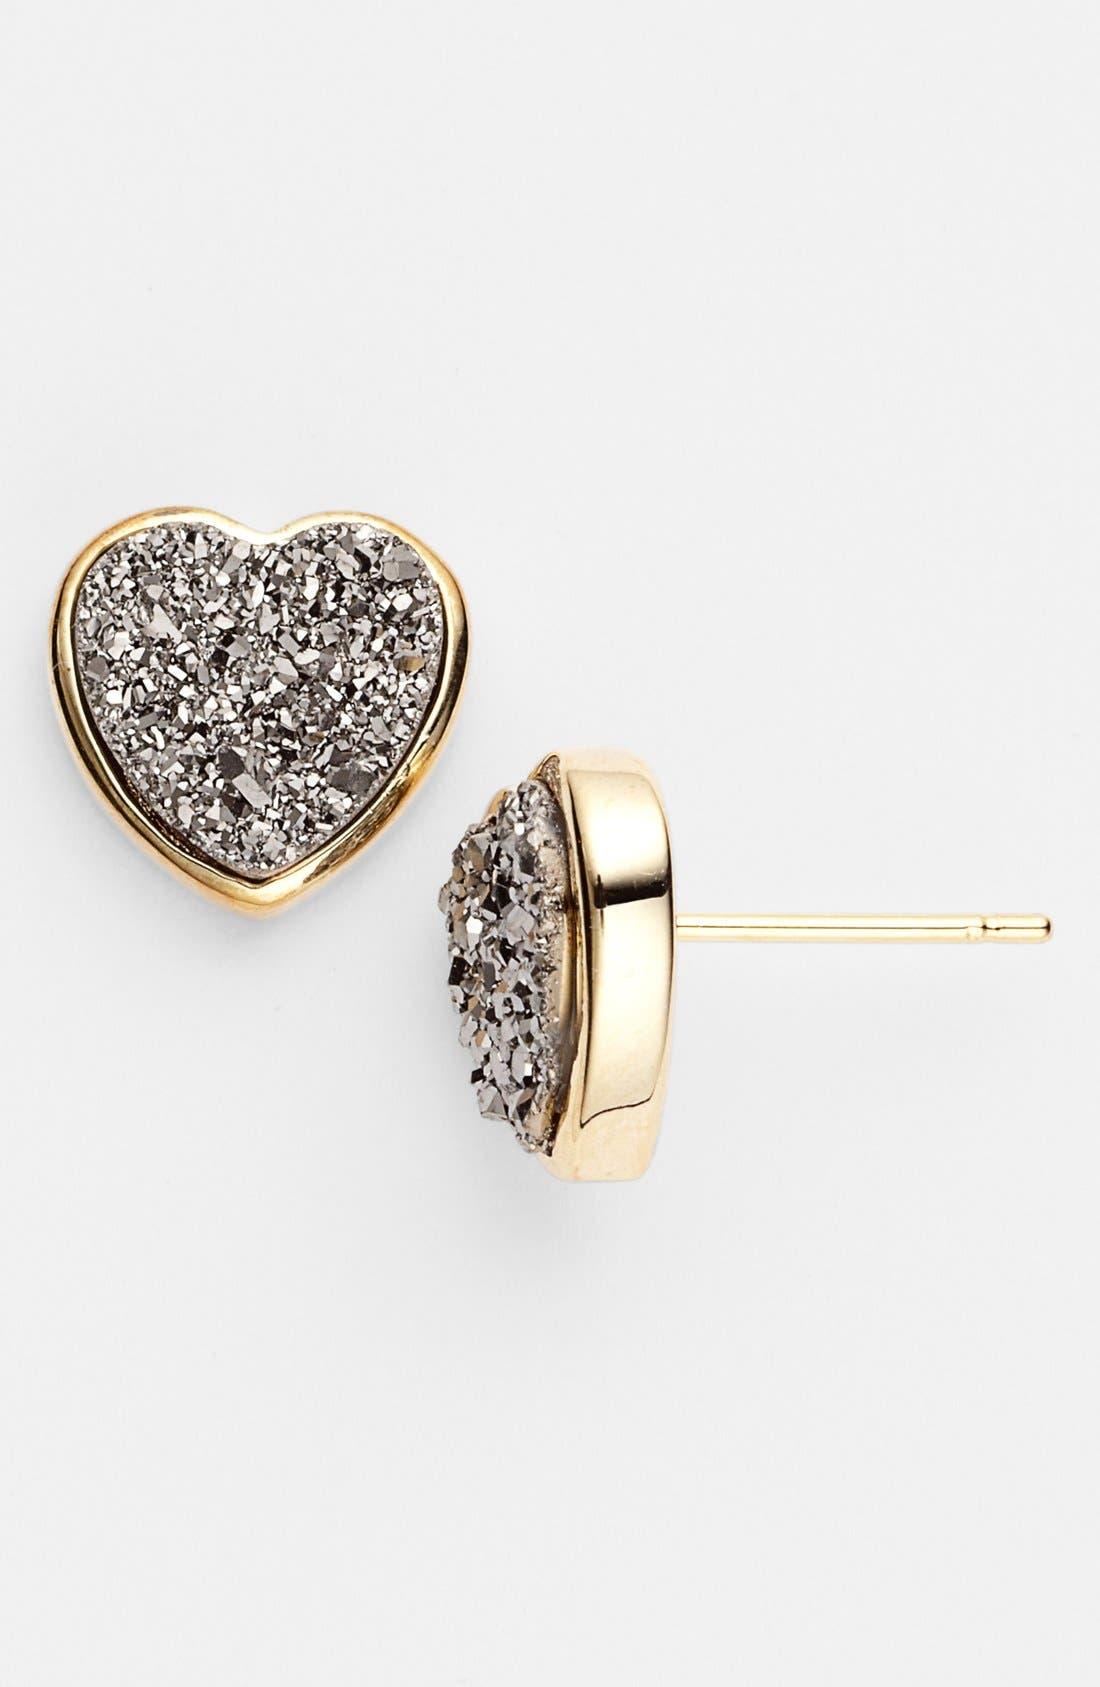 Alternate Image 1 Selected - Marcia Moran 'Drusy Extravaganza' Heart Stud Earrings (Online Only)